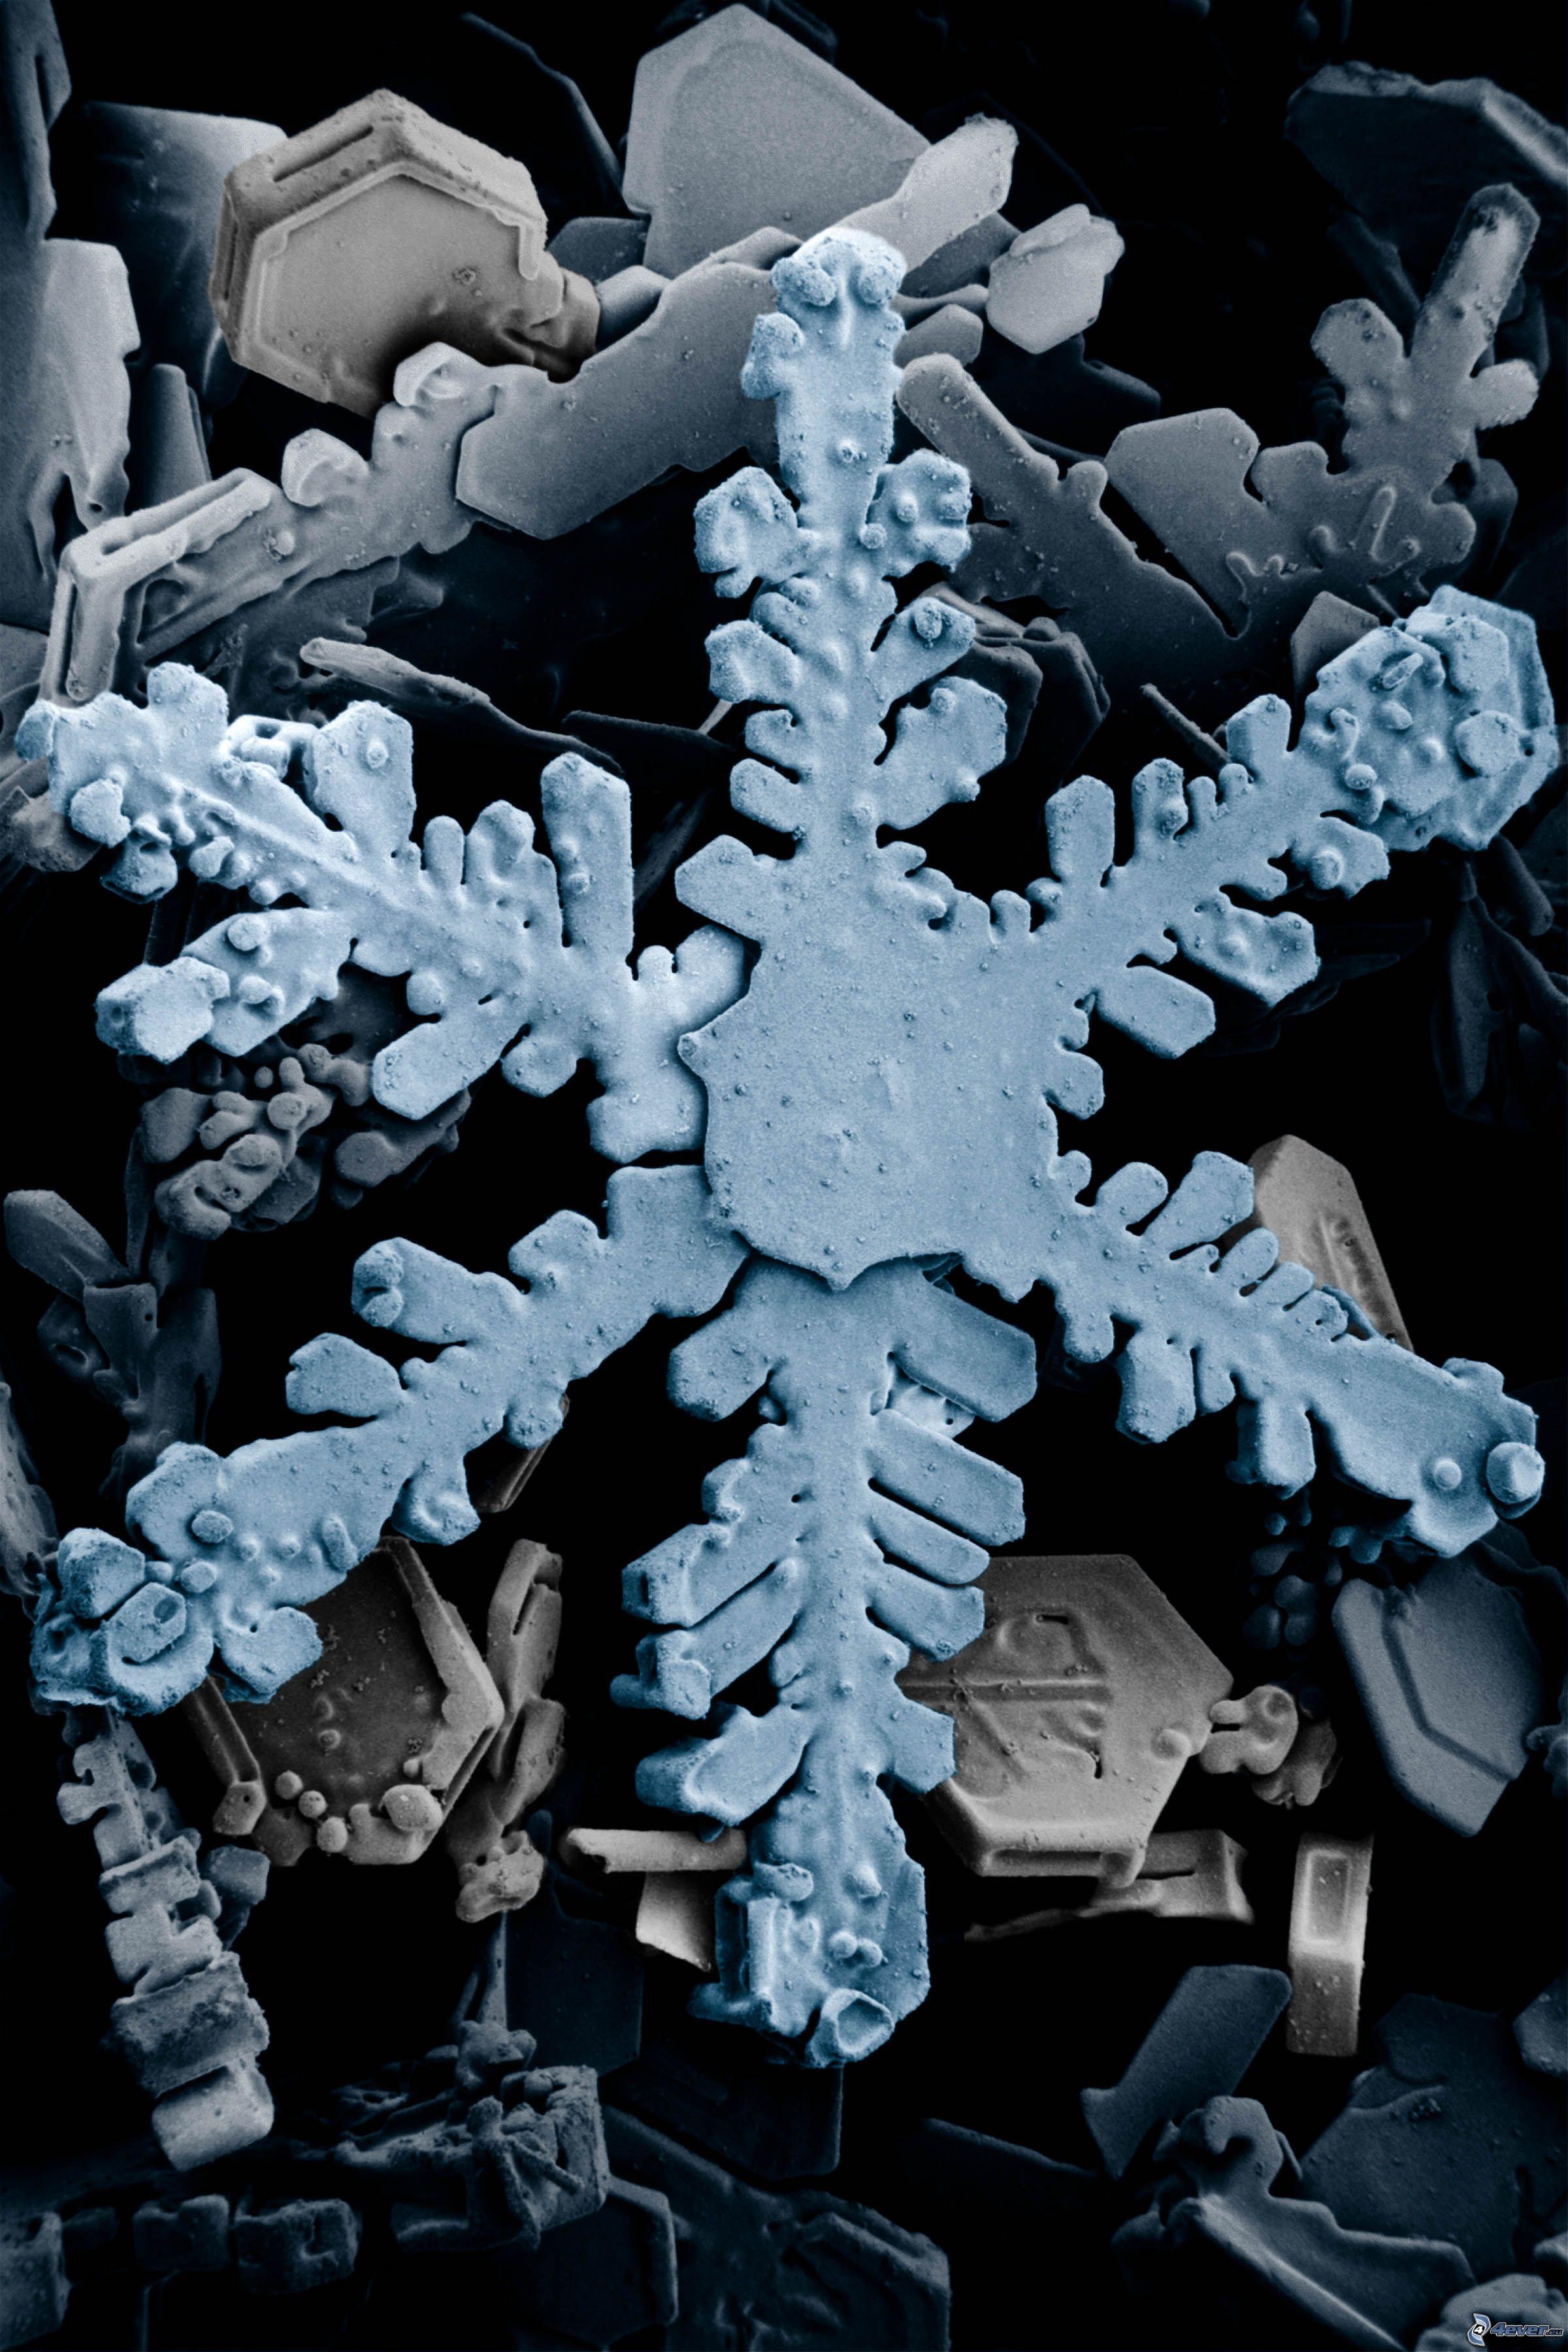 Flocon de neige - Gabarit flocon de neige a decouper ...